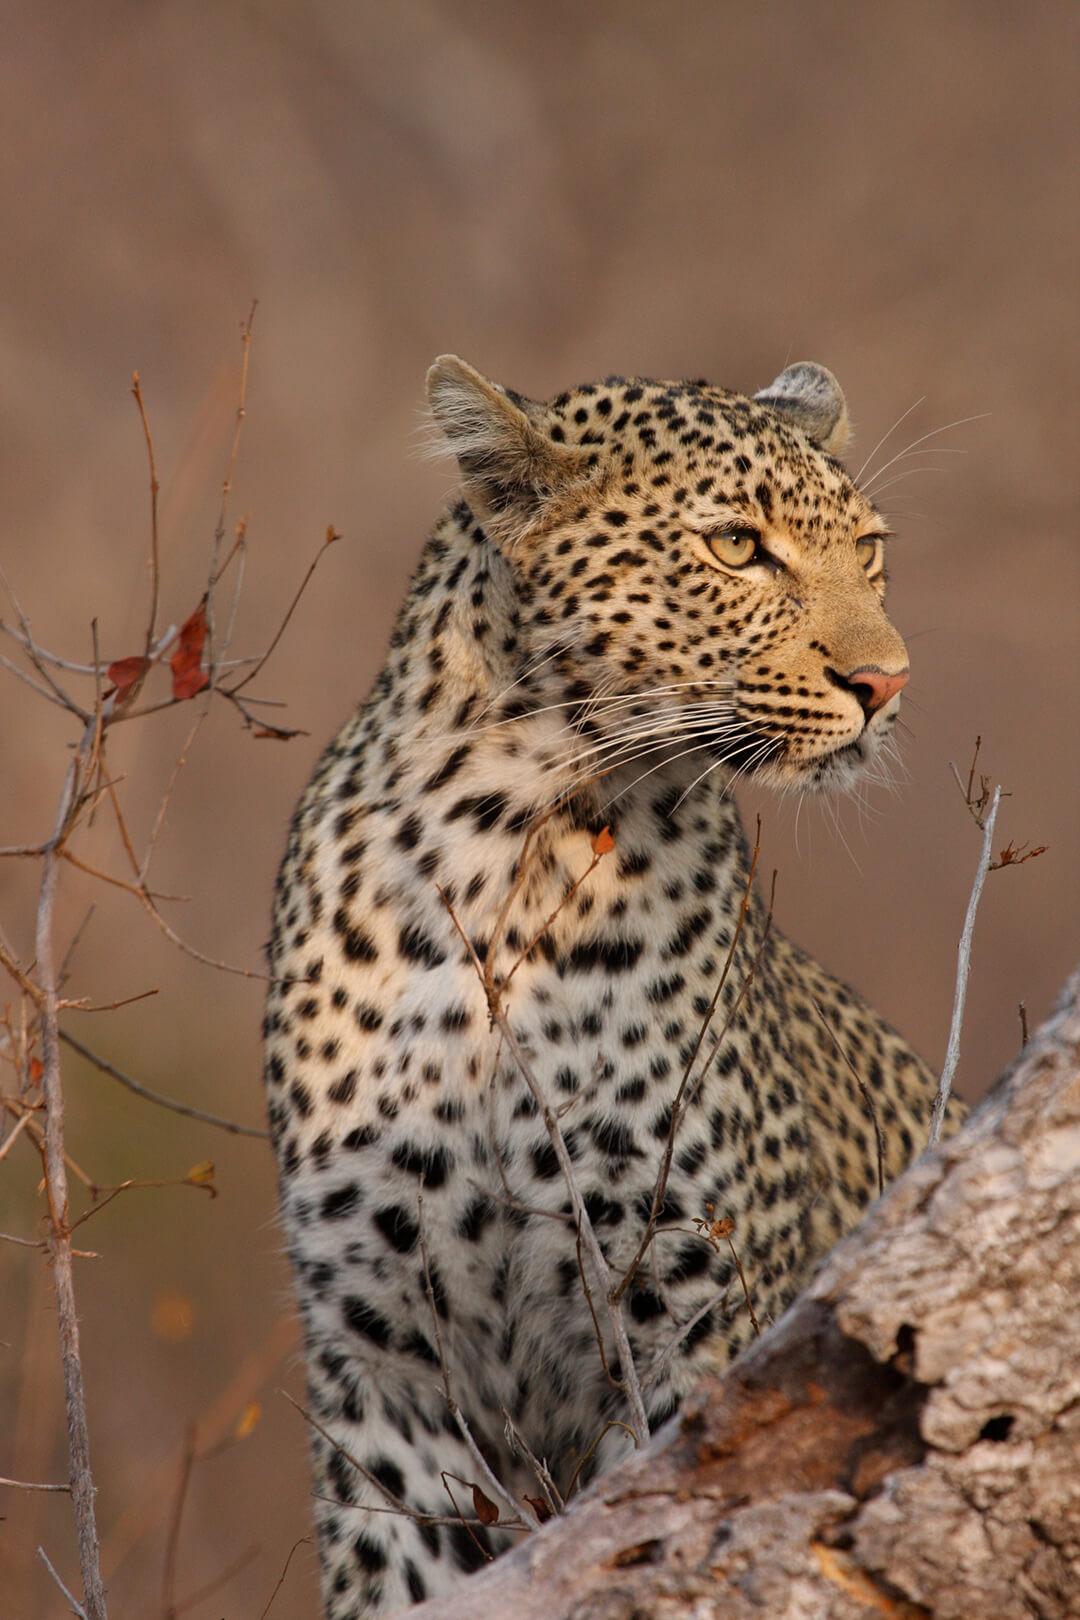 Kwela kwela 2 - photograph by Malcolm Bowling